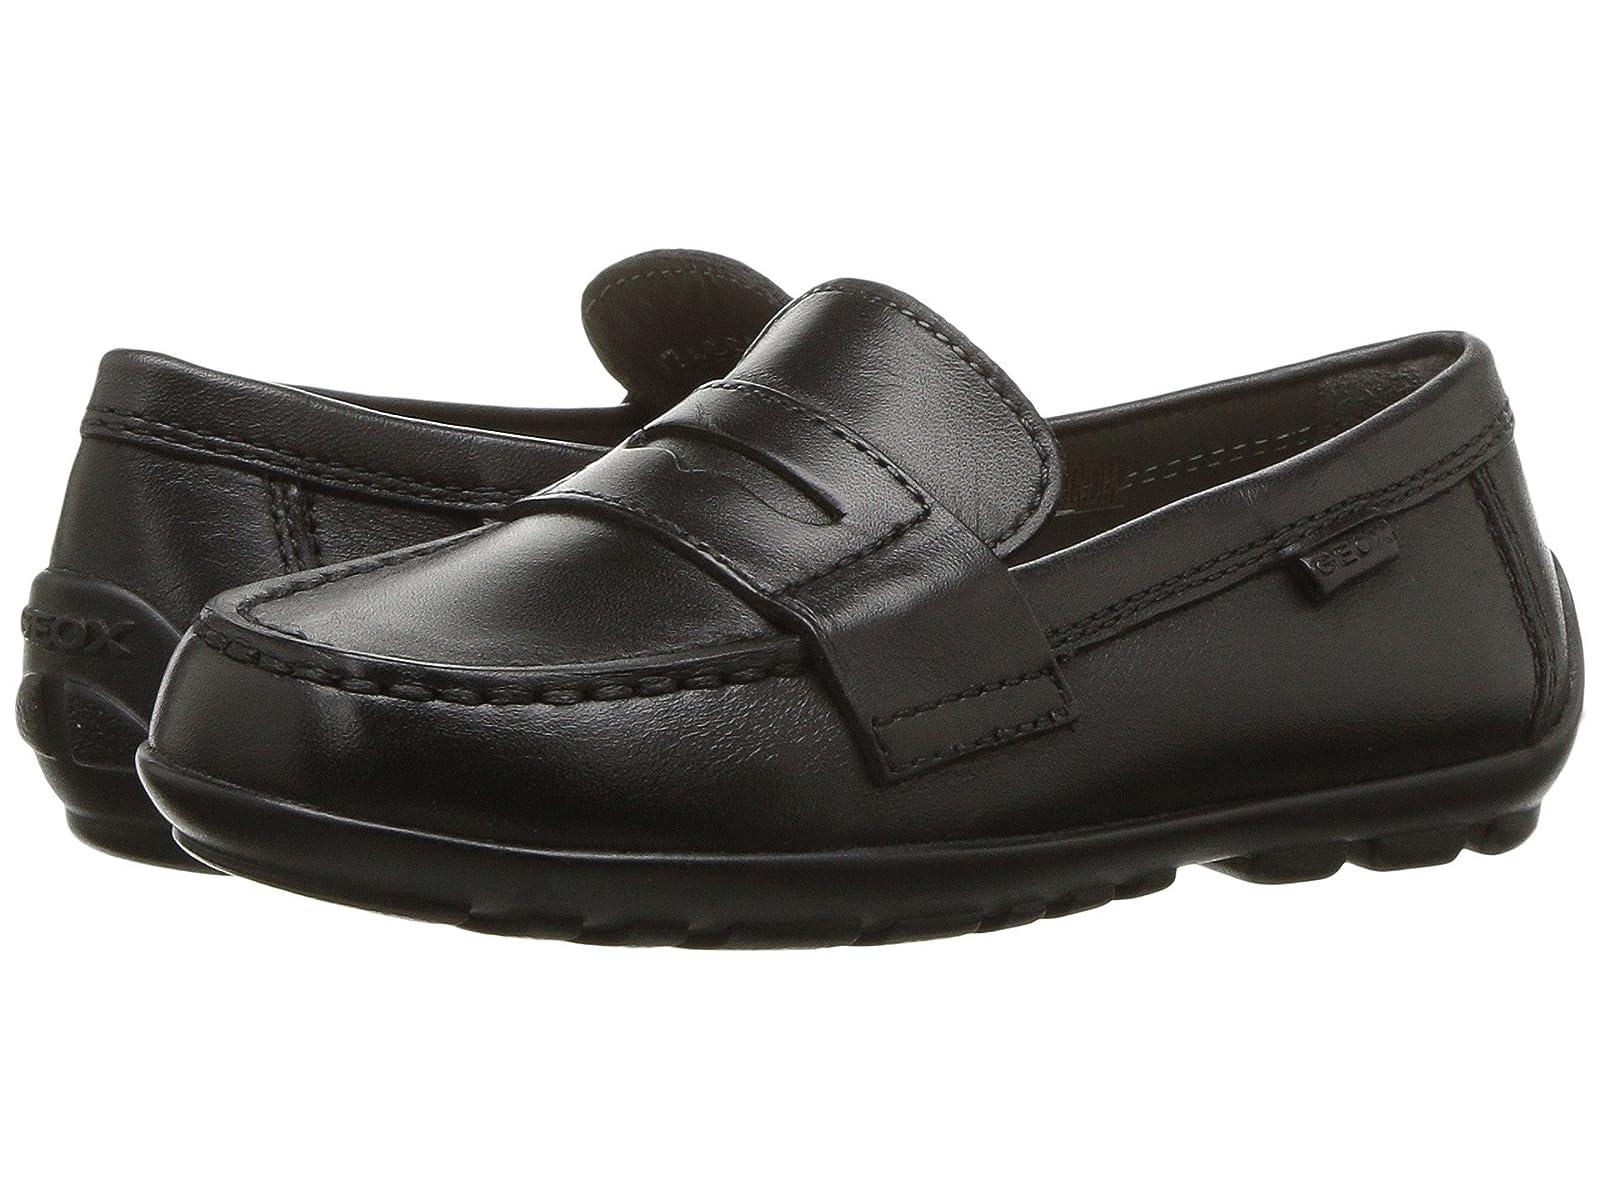 Geox Kids Jr Fast 1 (Toddler/Little Kid)Atmospheric grades have affordable shoes